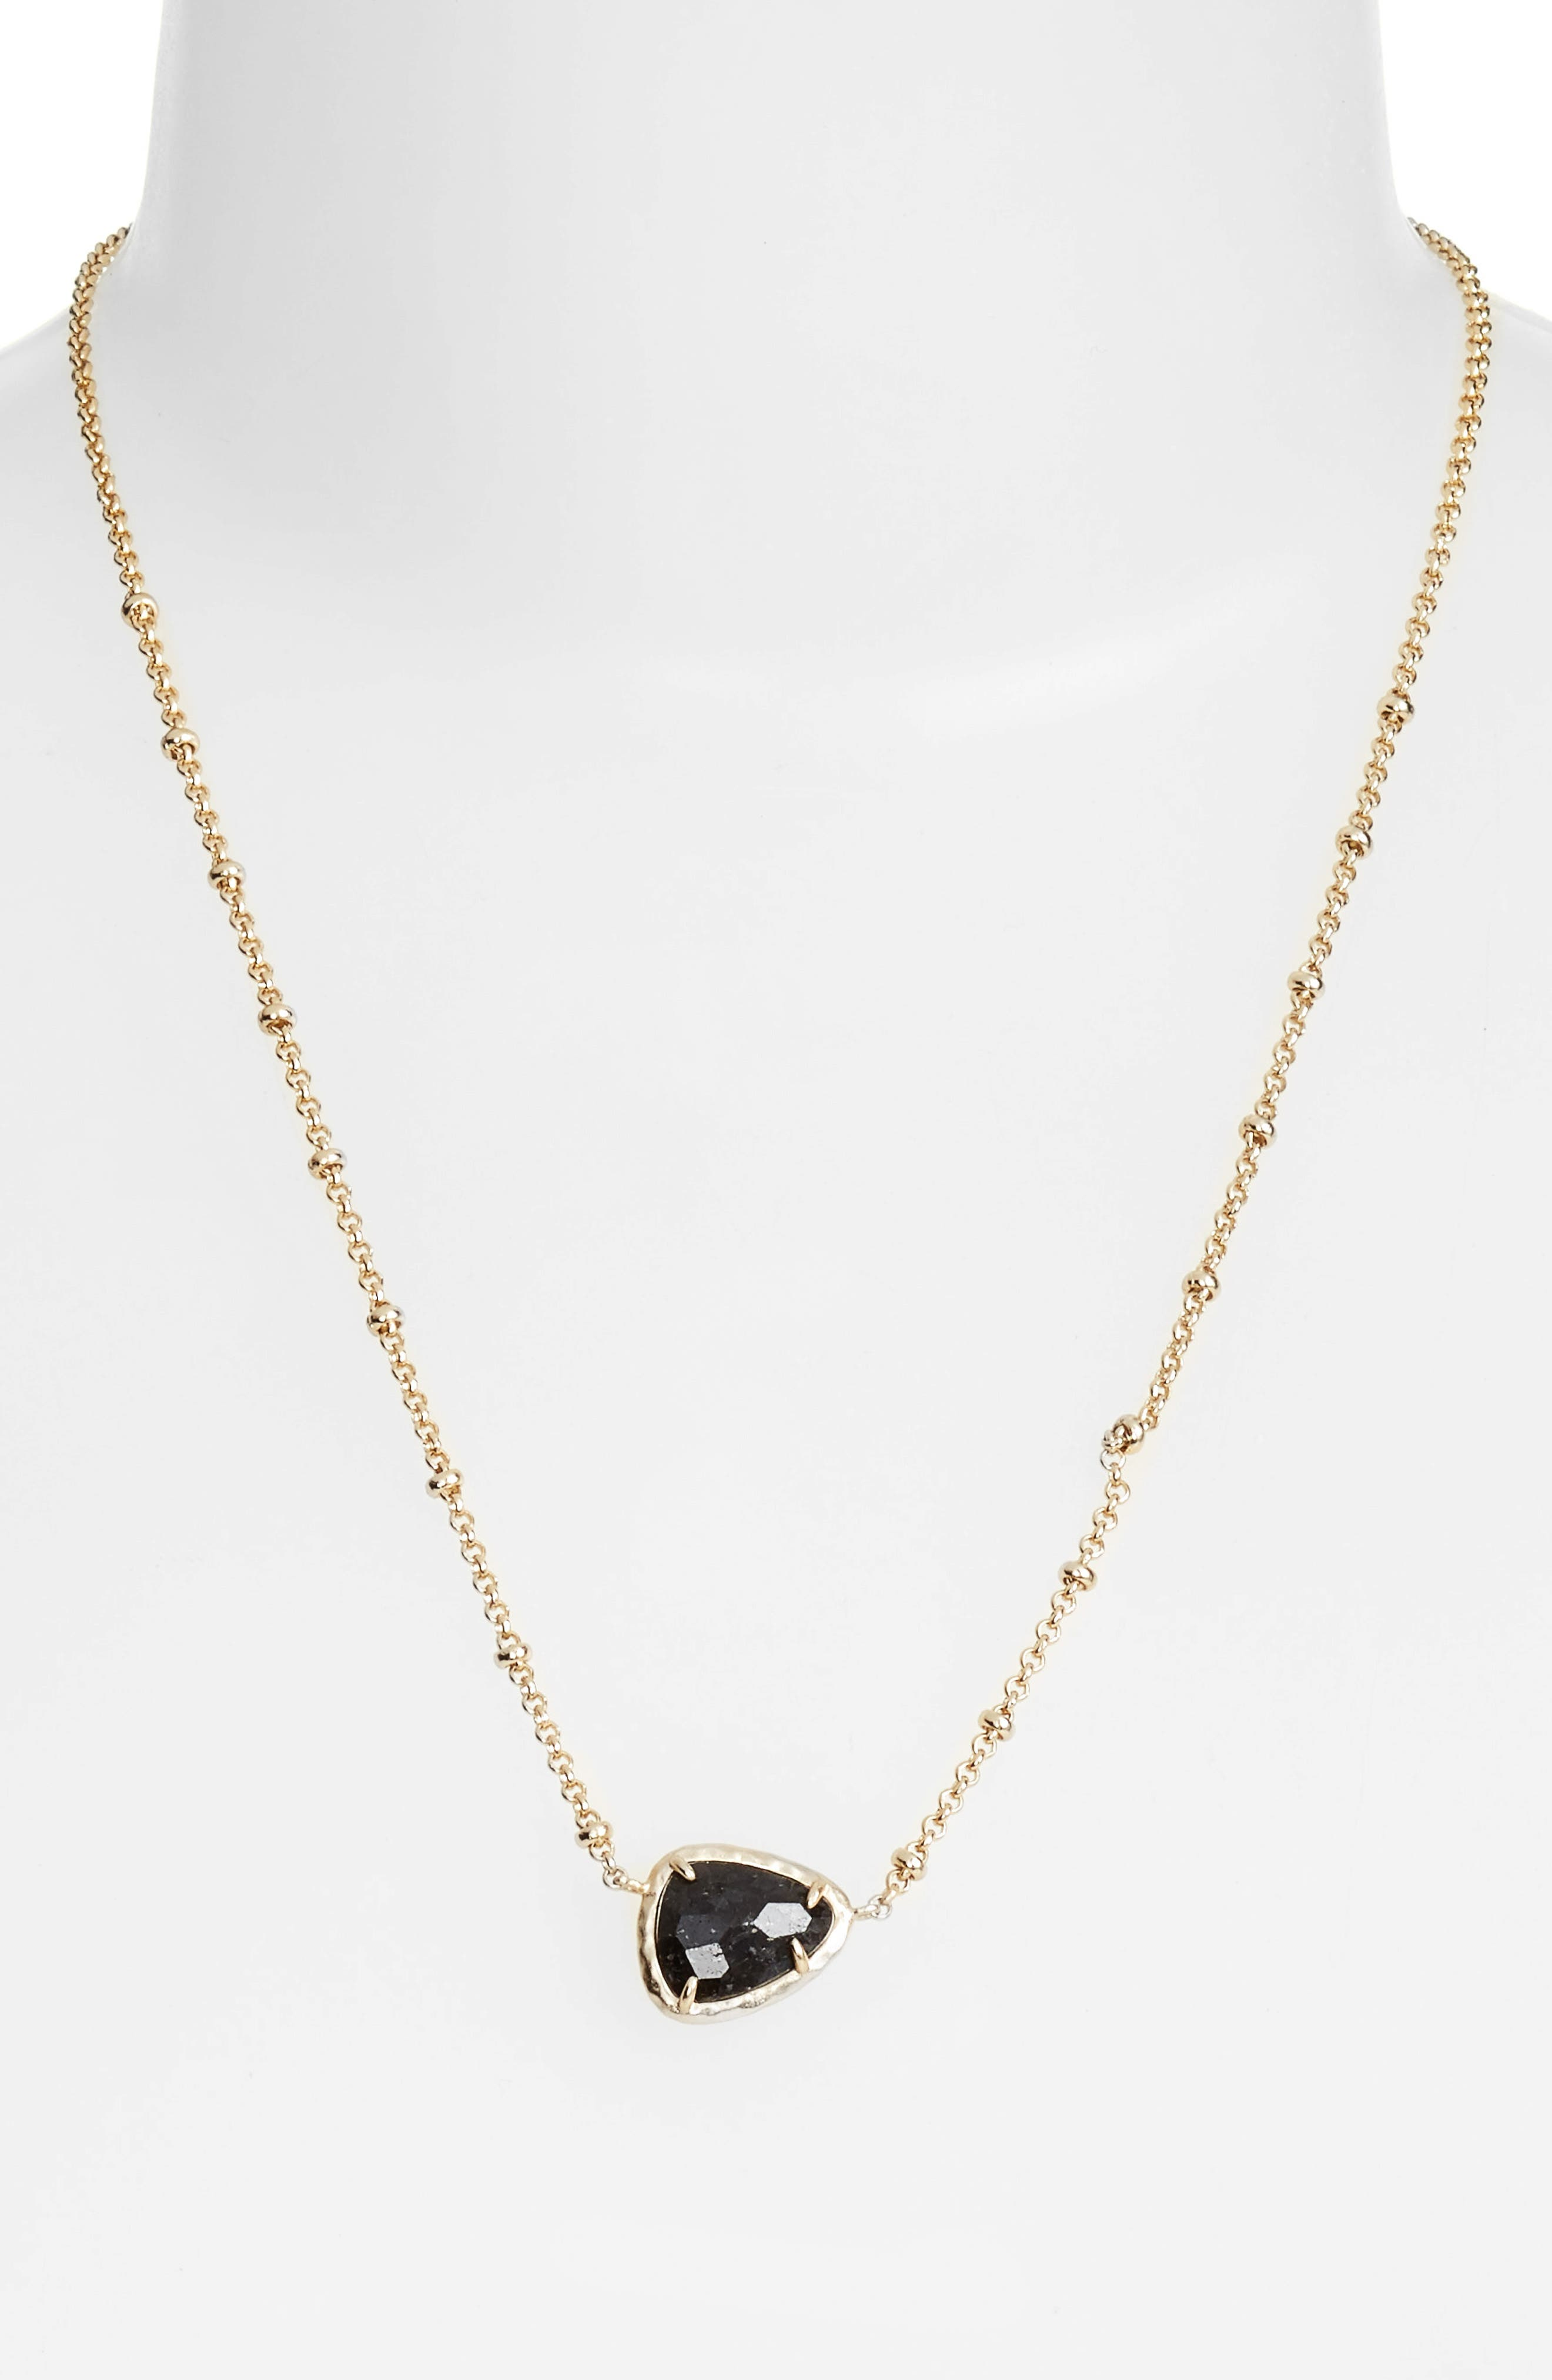 Kendra Scott Arleen Pendant Necklace